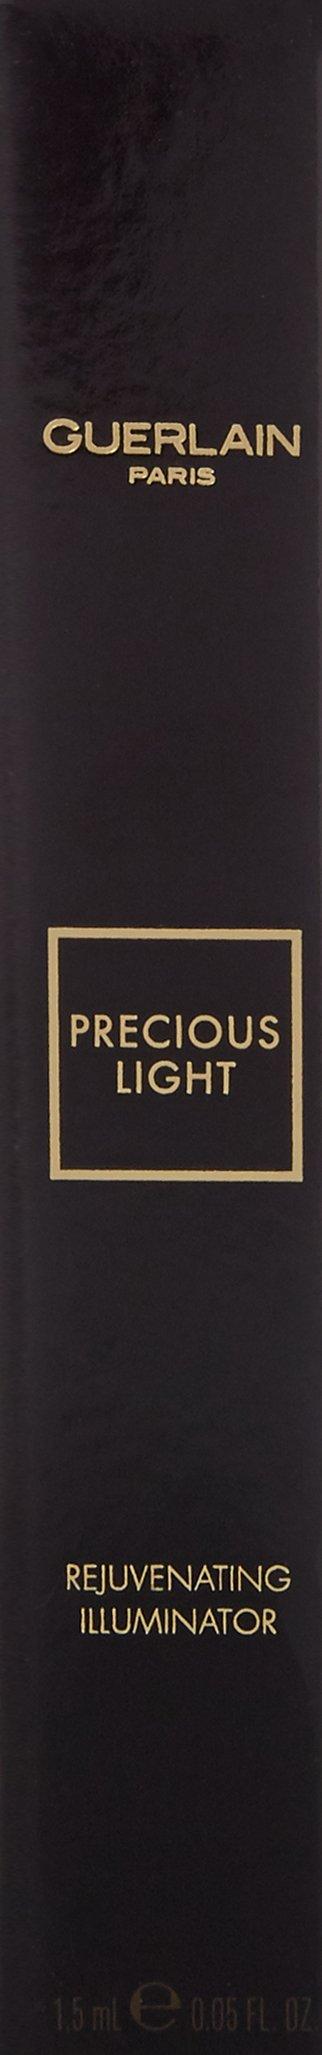 Guerlain Precious Light Rejuvenating Illuminator, 02, 0.05 Ounce by GUERLAIN (Image #3)